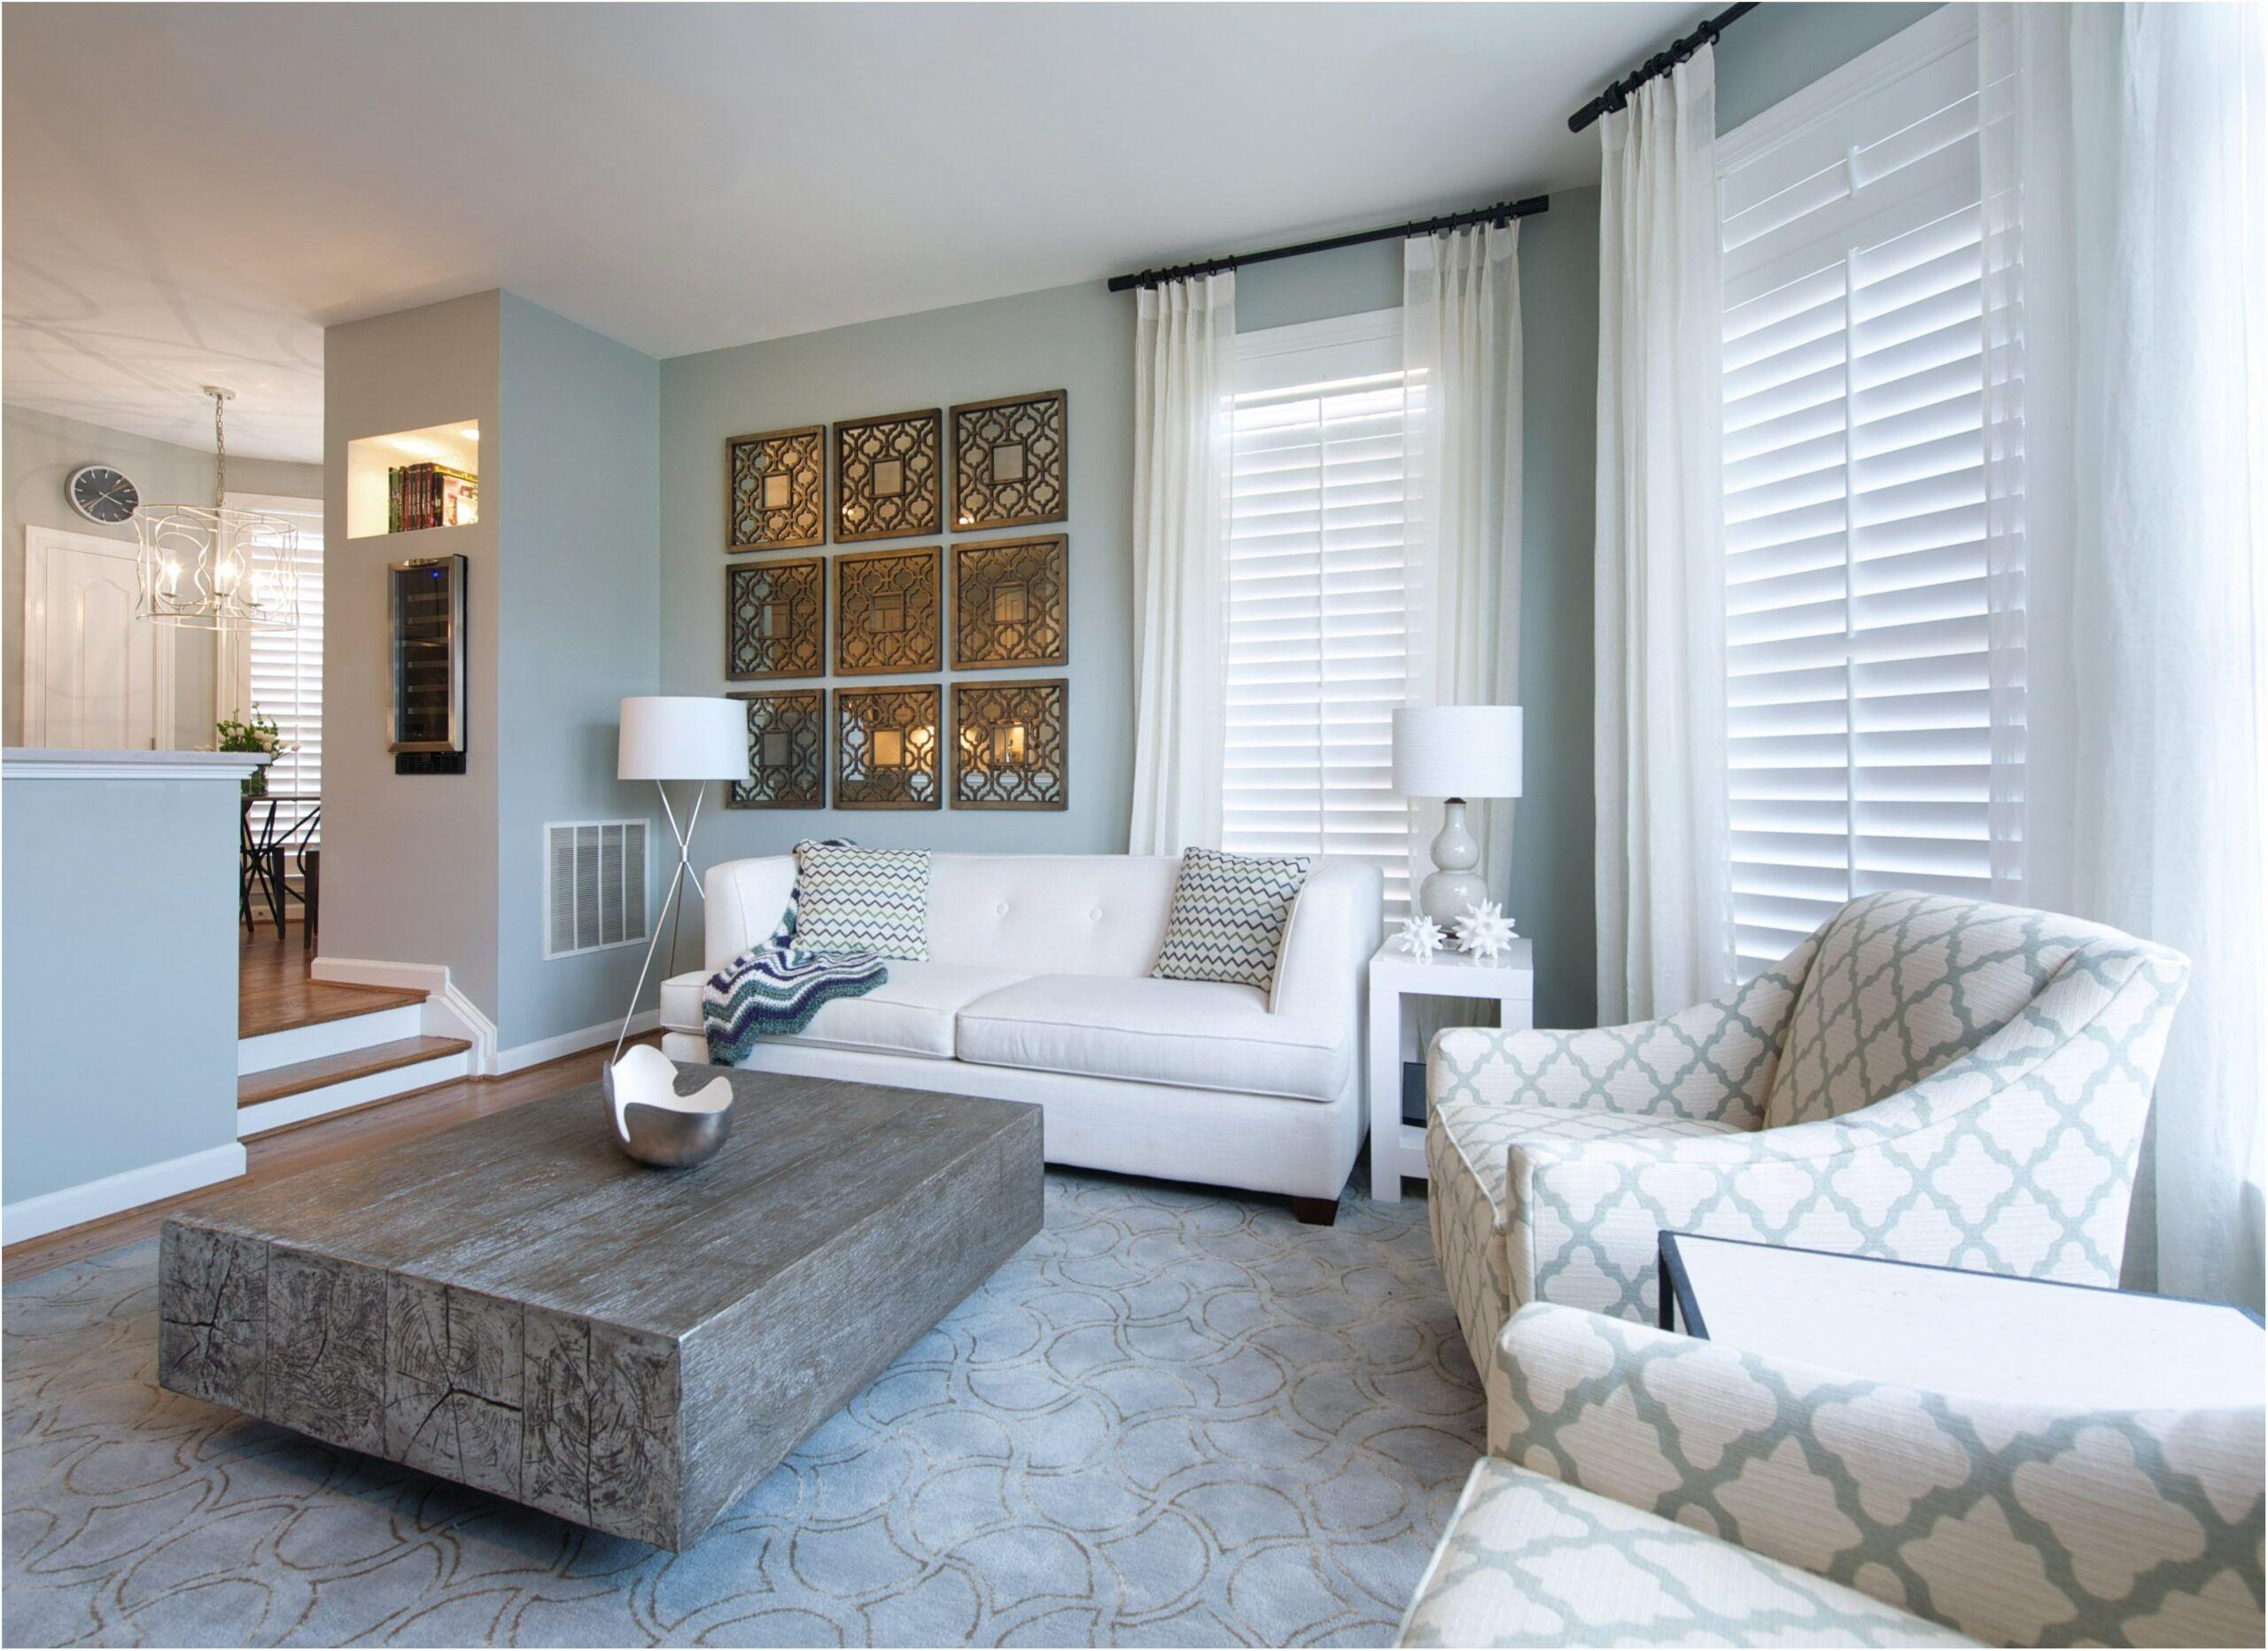 Calm Paint Colors For Living Room Calm Colors Living Paint Room #soothing #colors #for #living #room